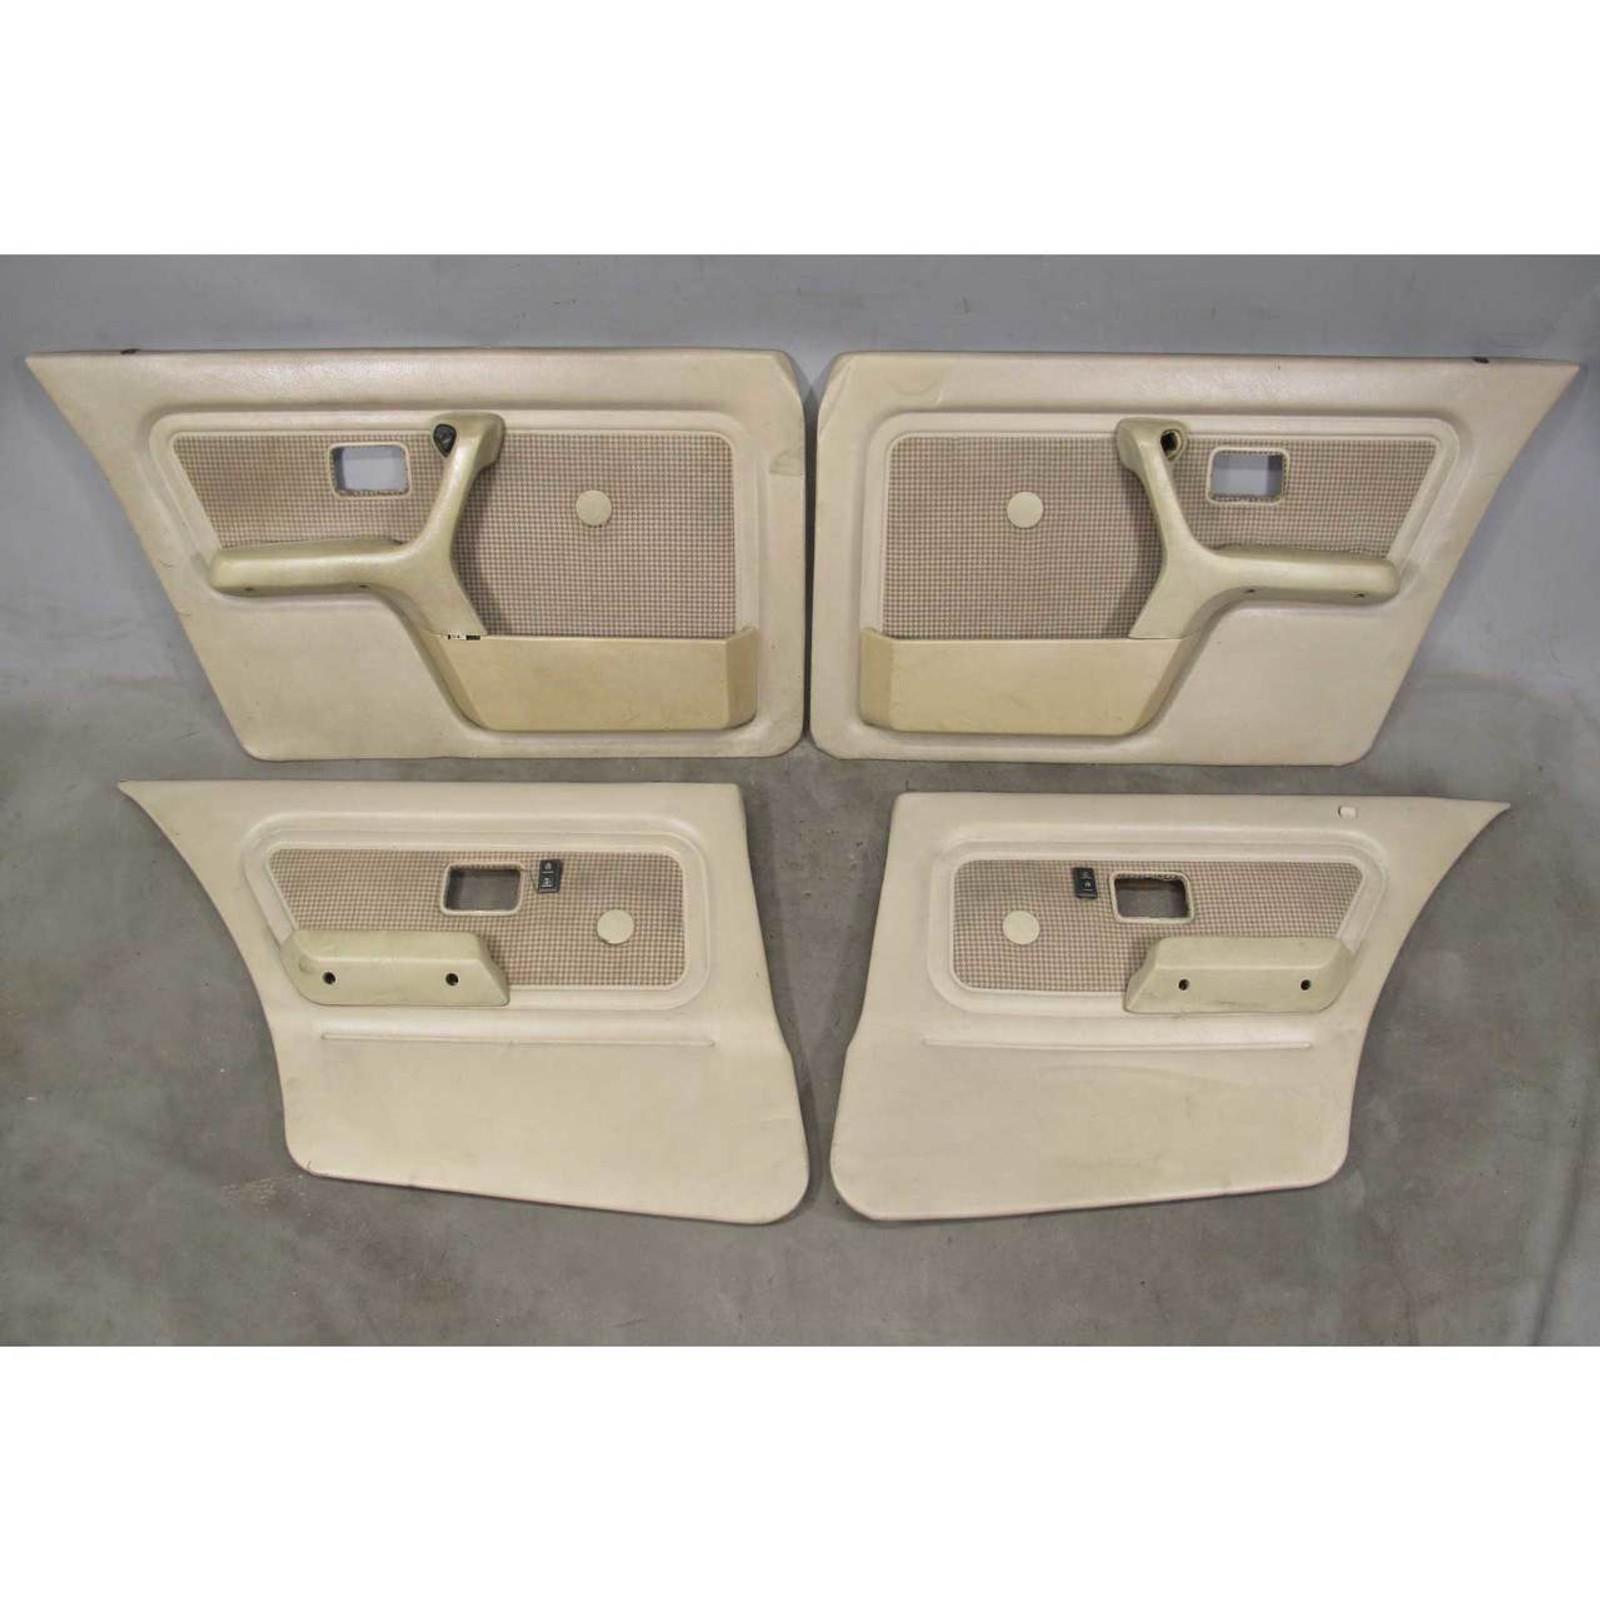 1986 1988 Bmw E30 3 Series Sedan Interior Door Panel Trim Skin Pair Beige Cloth Prussian Motors